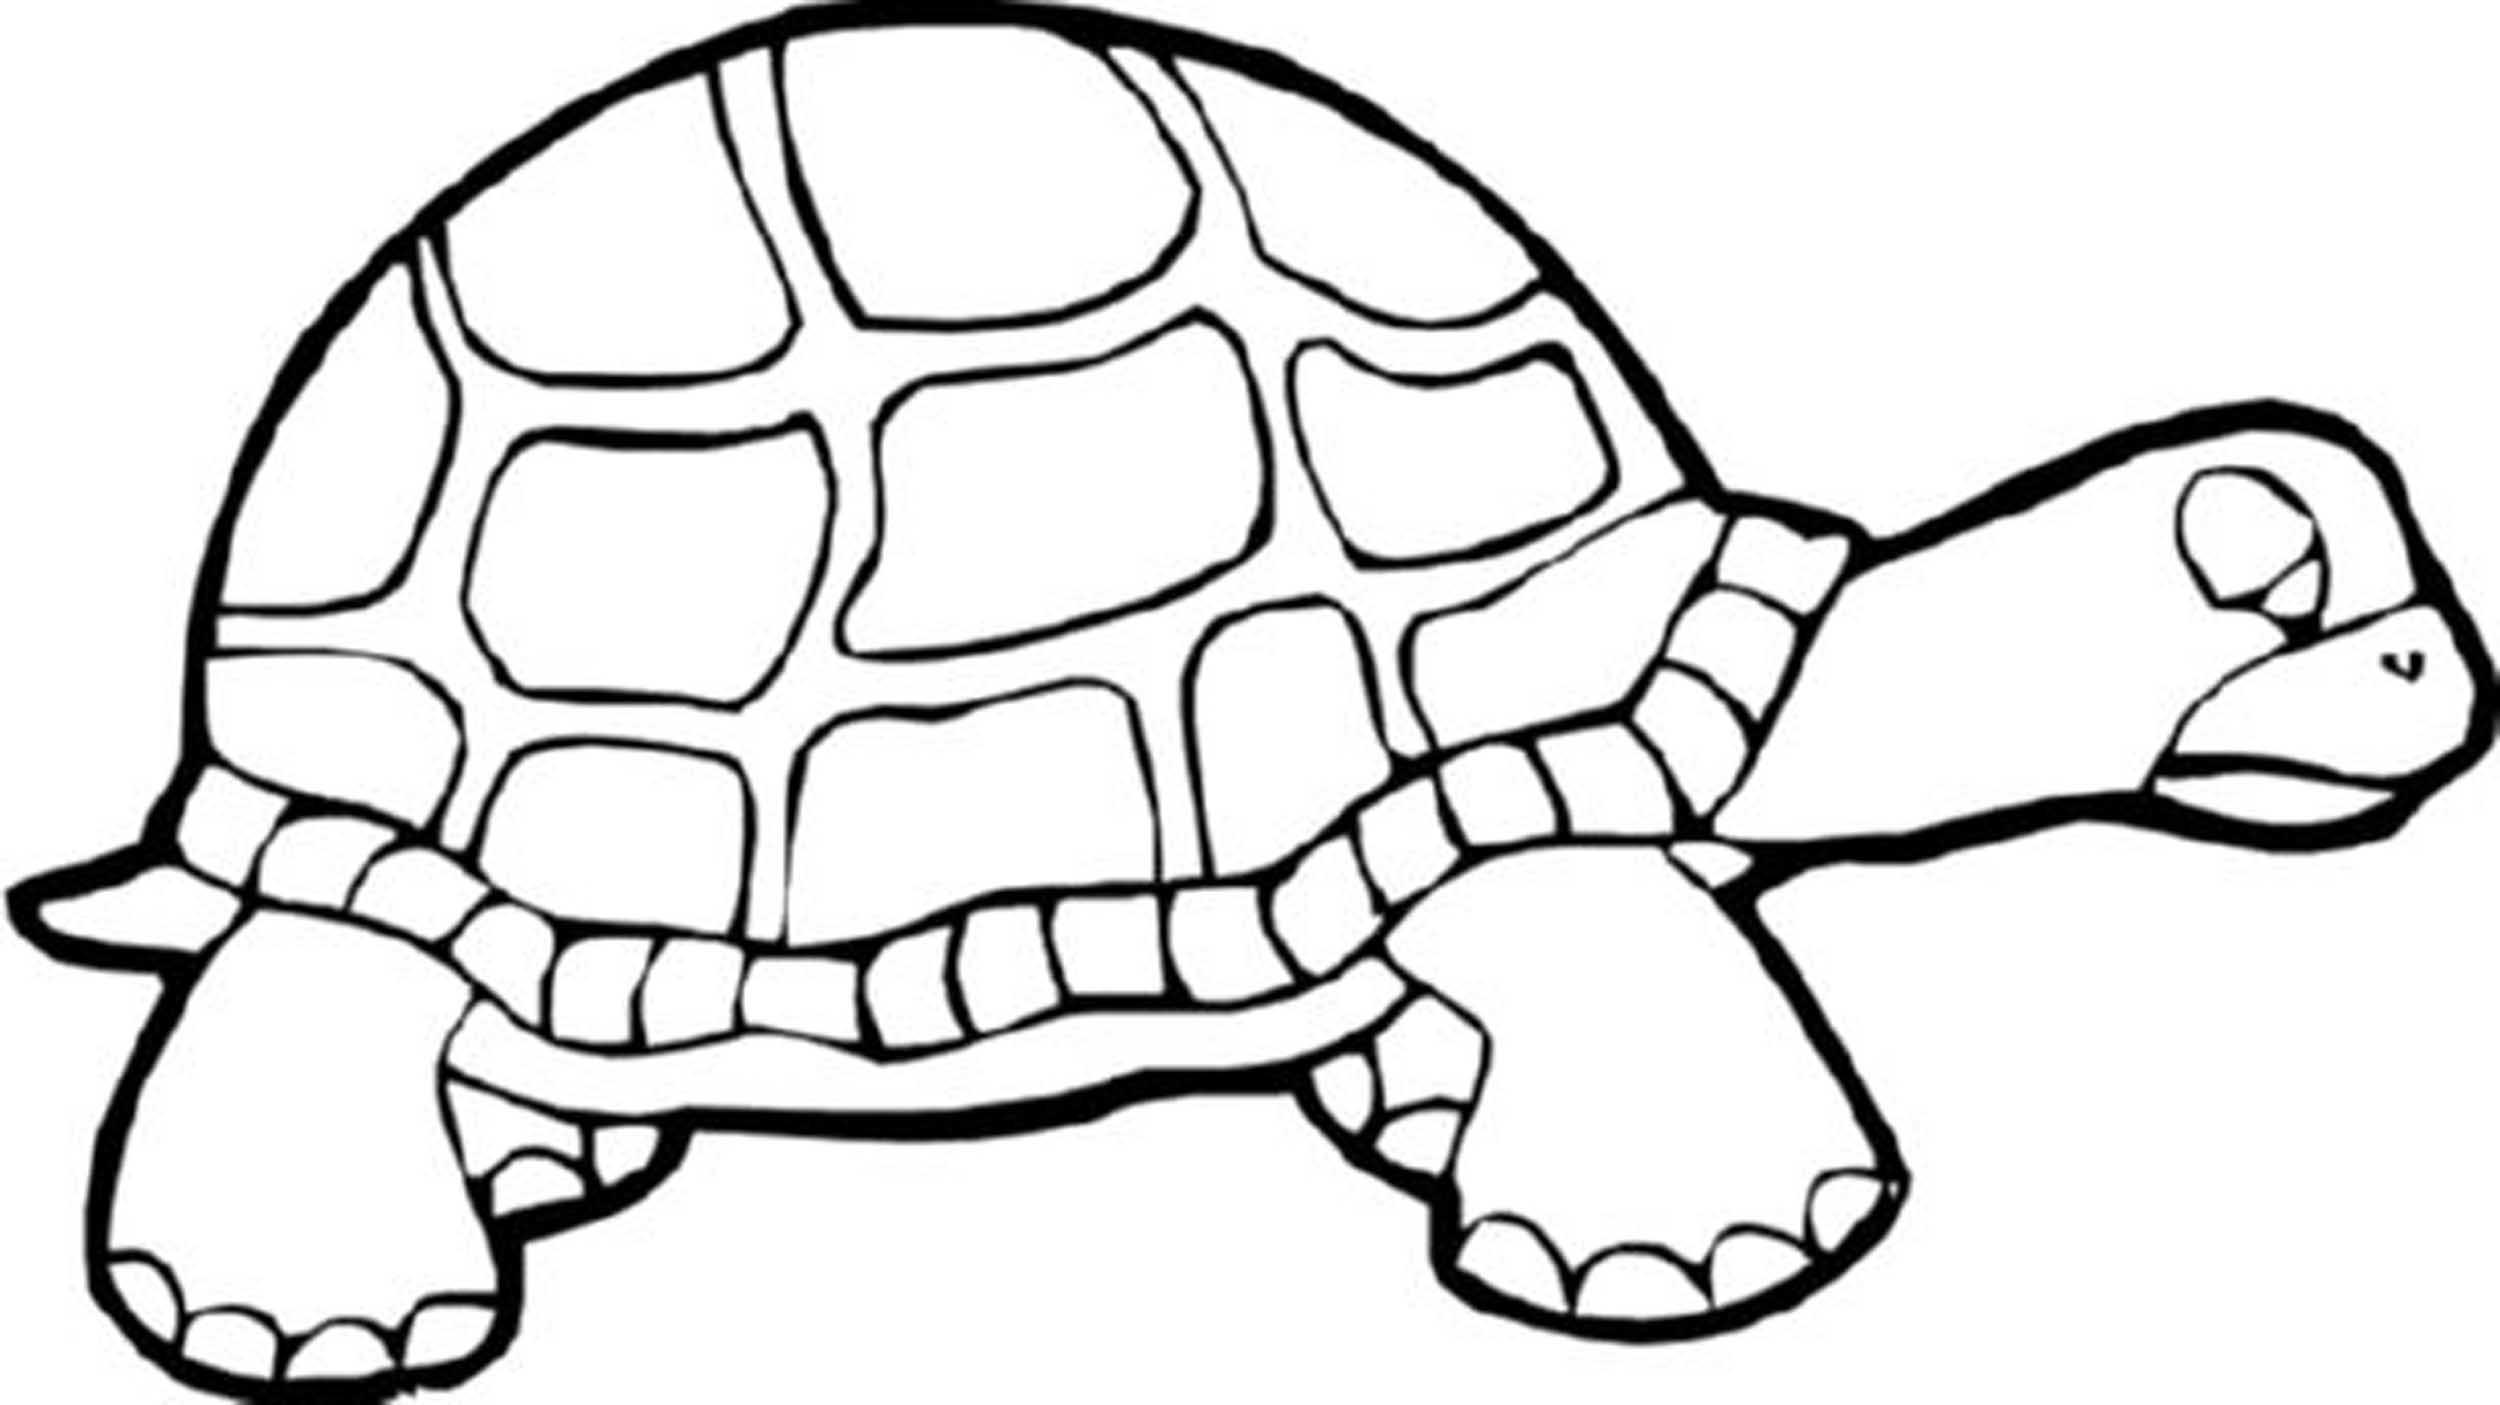 2500x1405 Ninja Turtles Coloring Page. Affordable Activities Nick Random